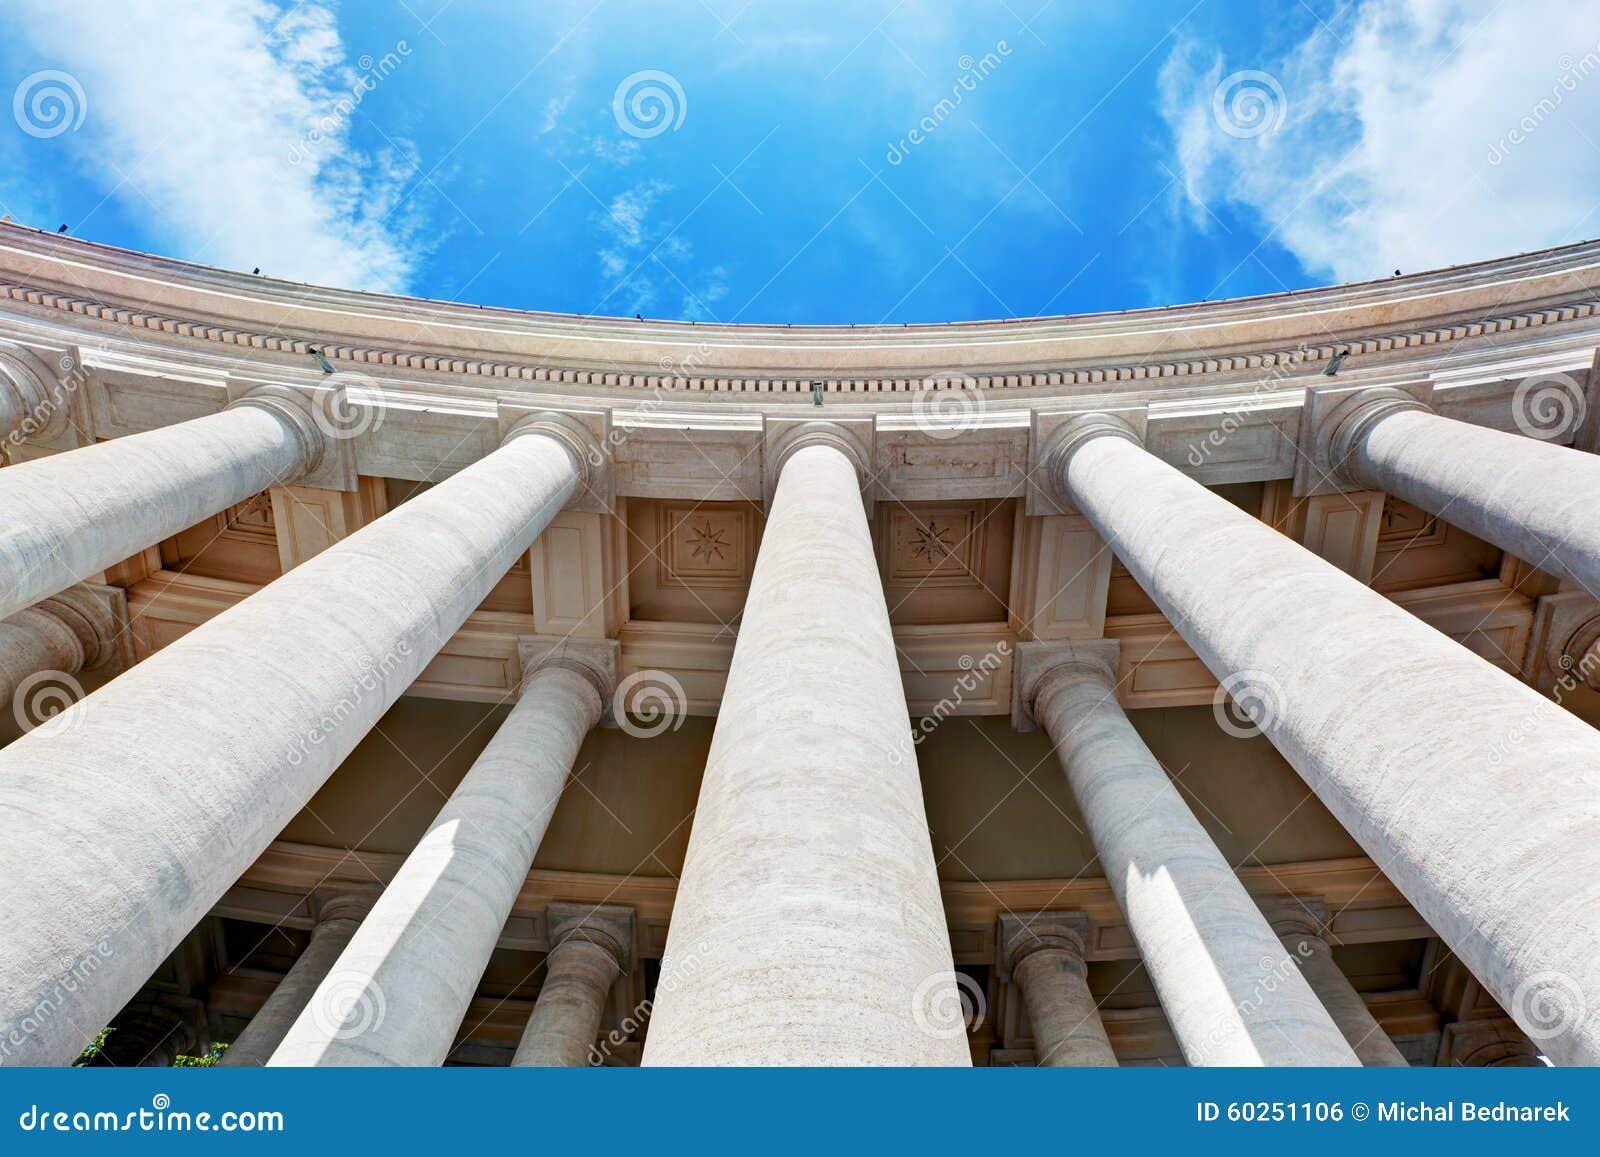 St. Peter s Basilica colonnades, columns in Vatican City.